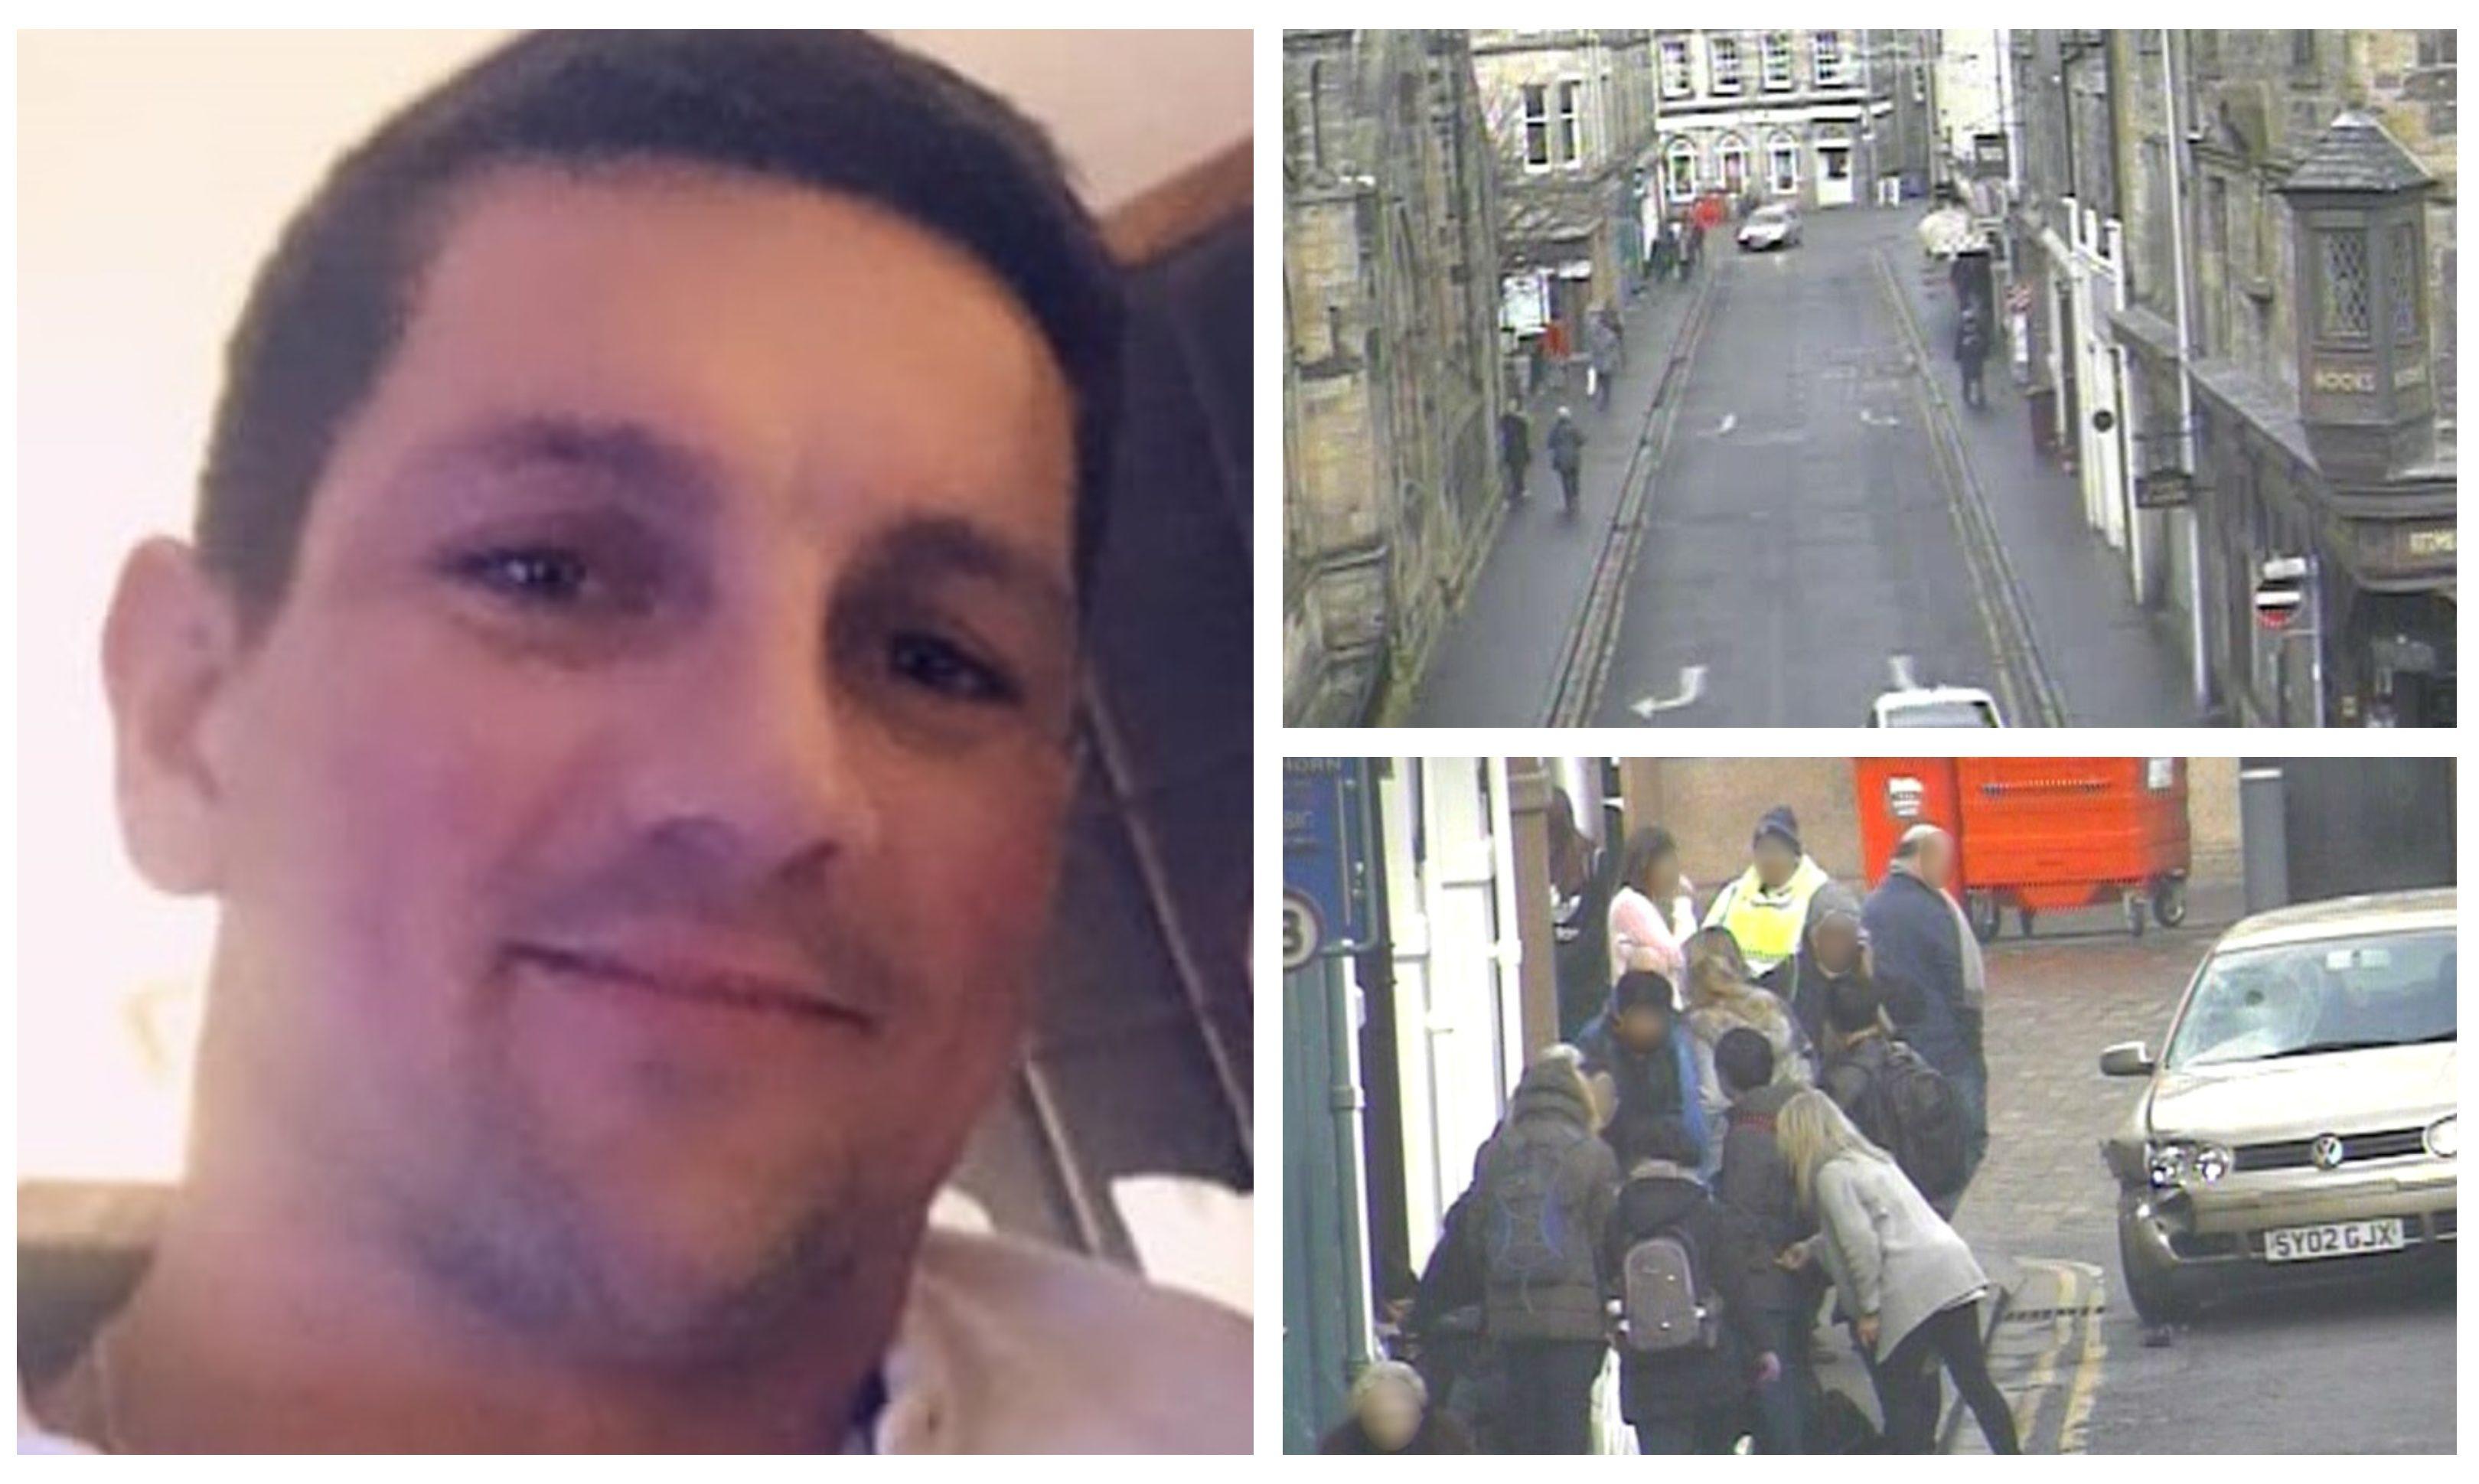 Edward Kolakovic drove into the group on St Andrews' Market Street.